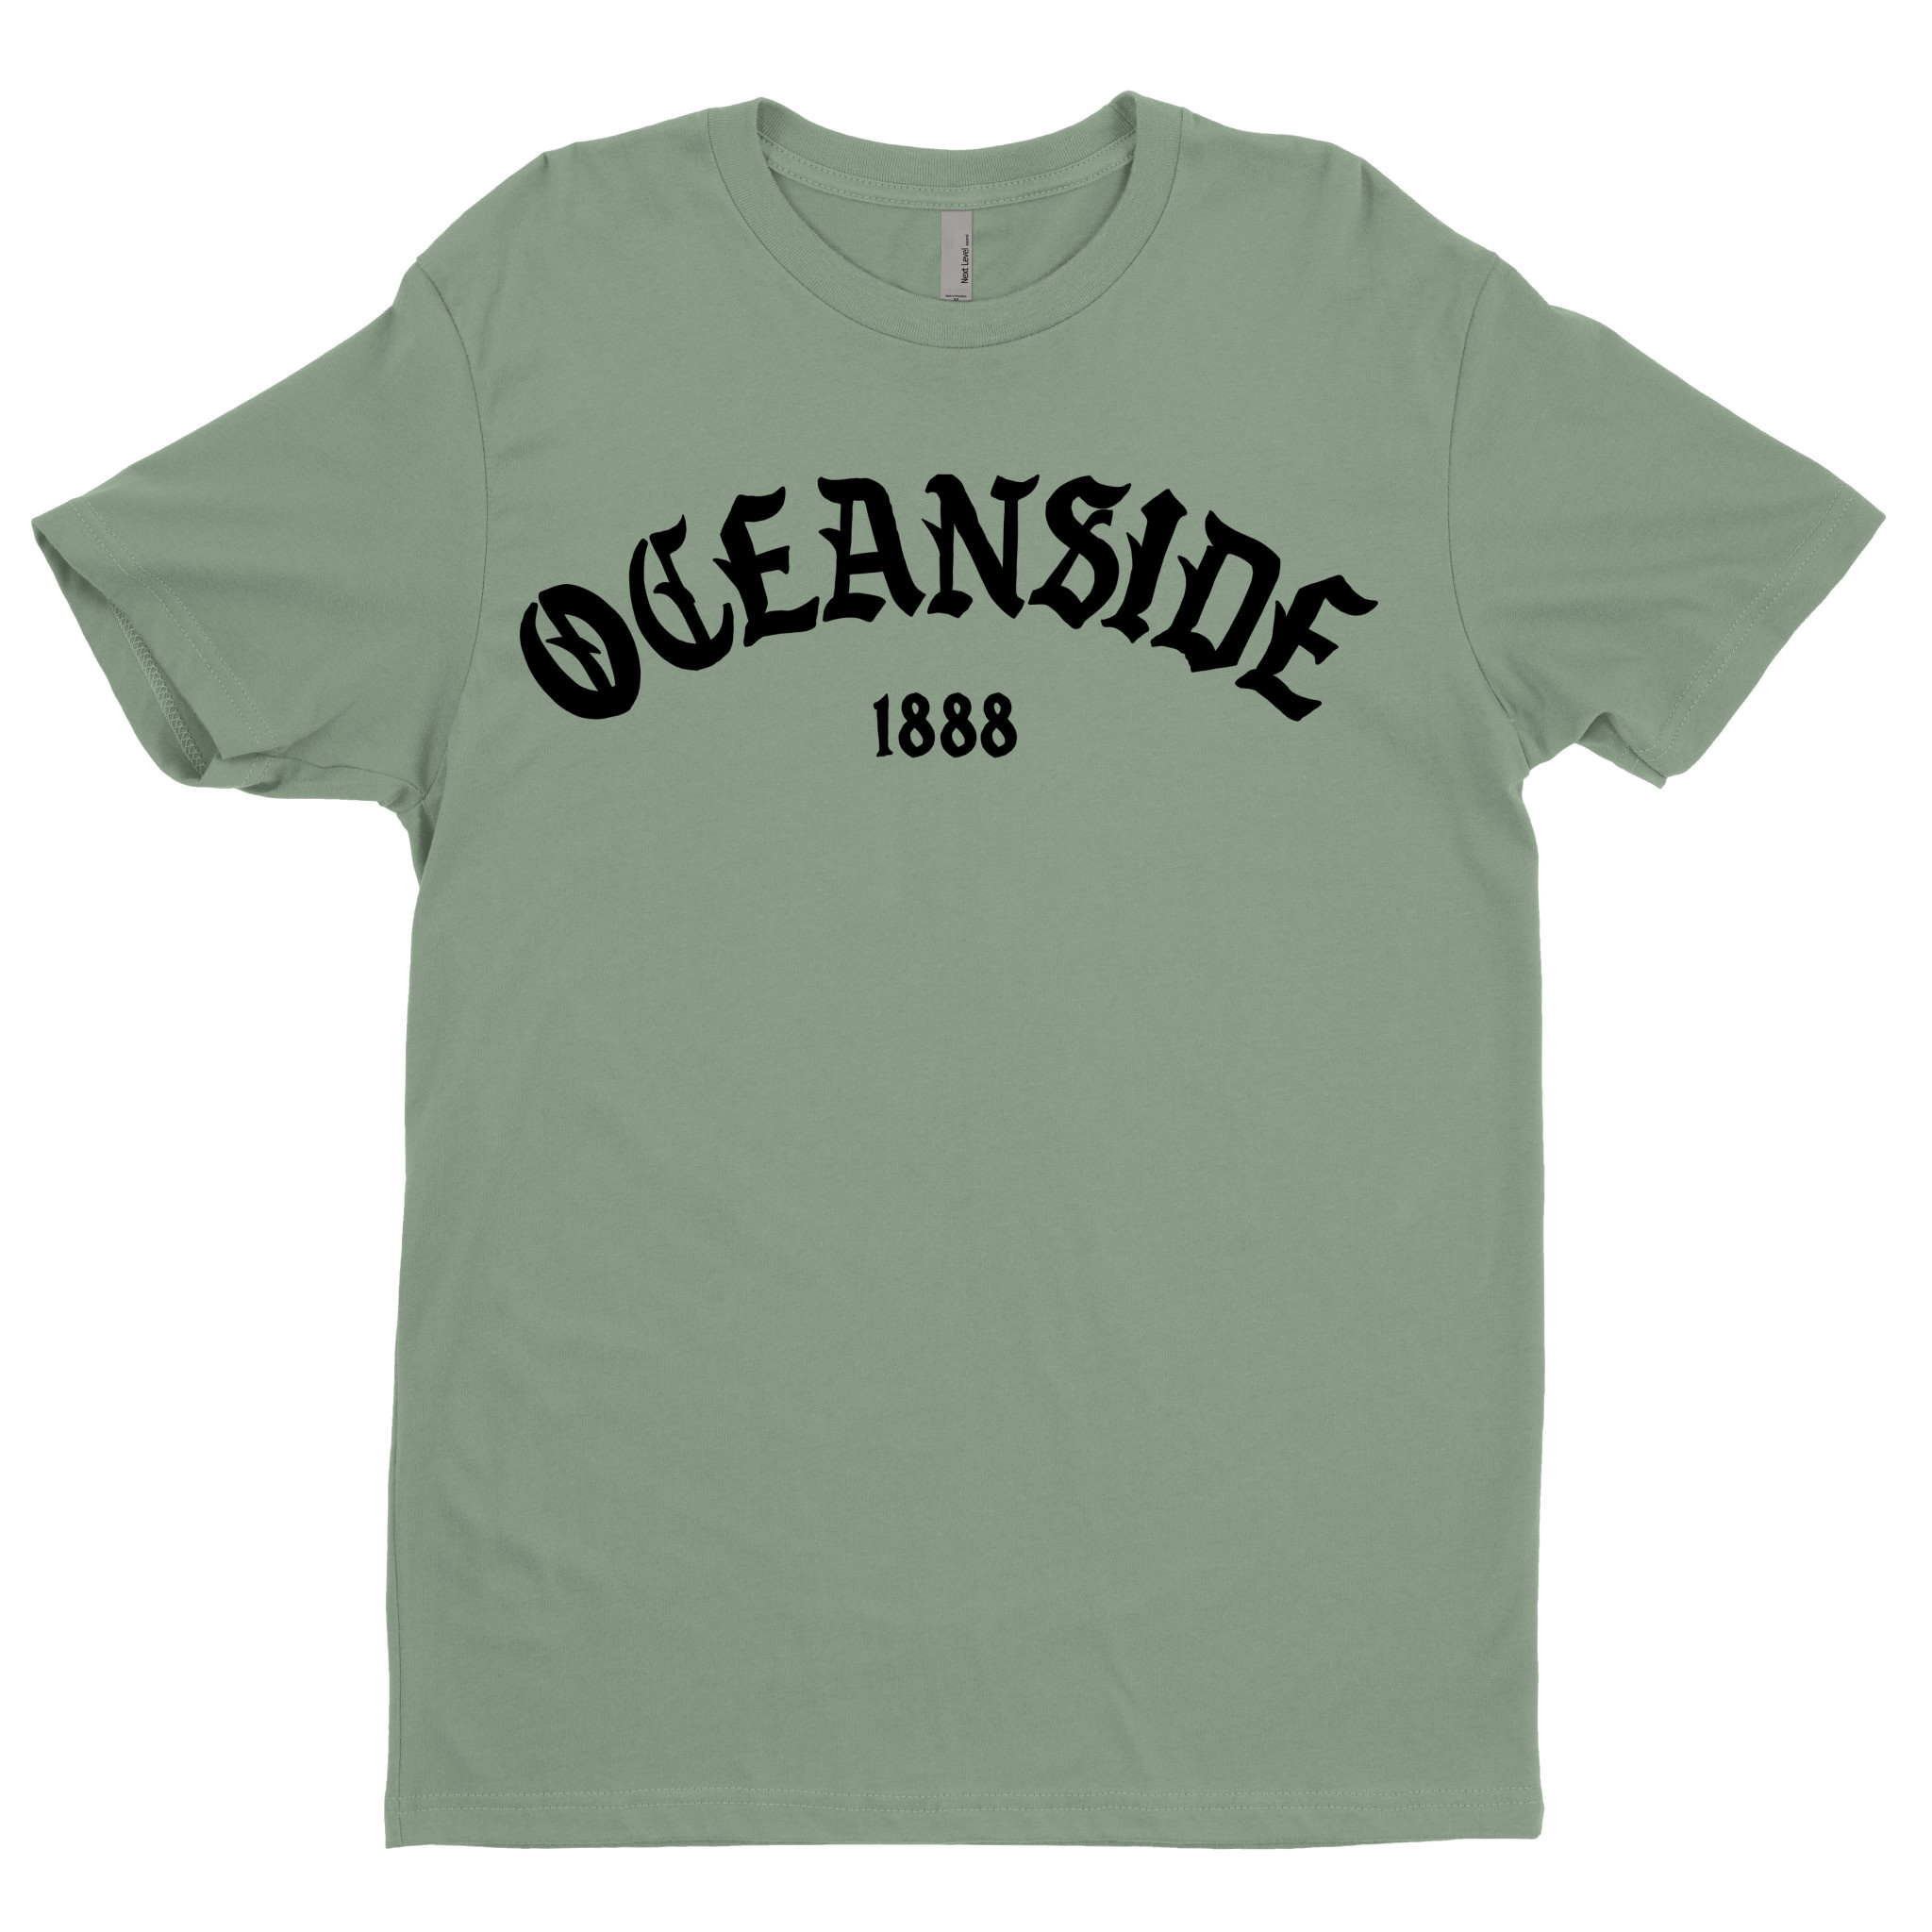 Old English BTC, Oceanside Tees